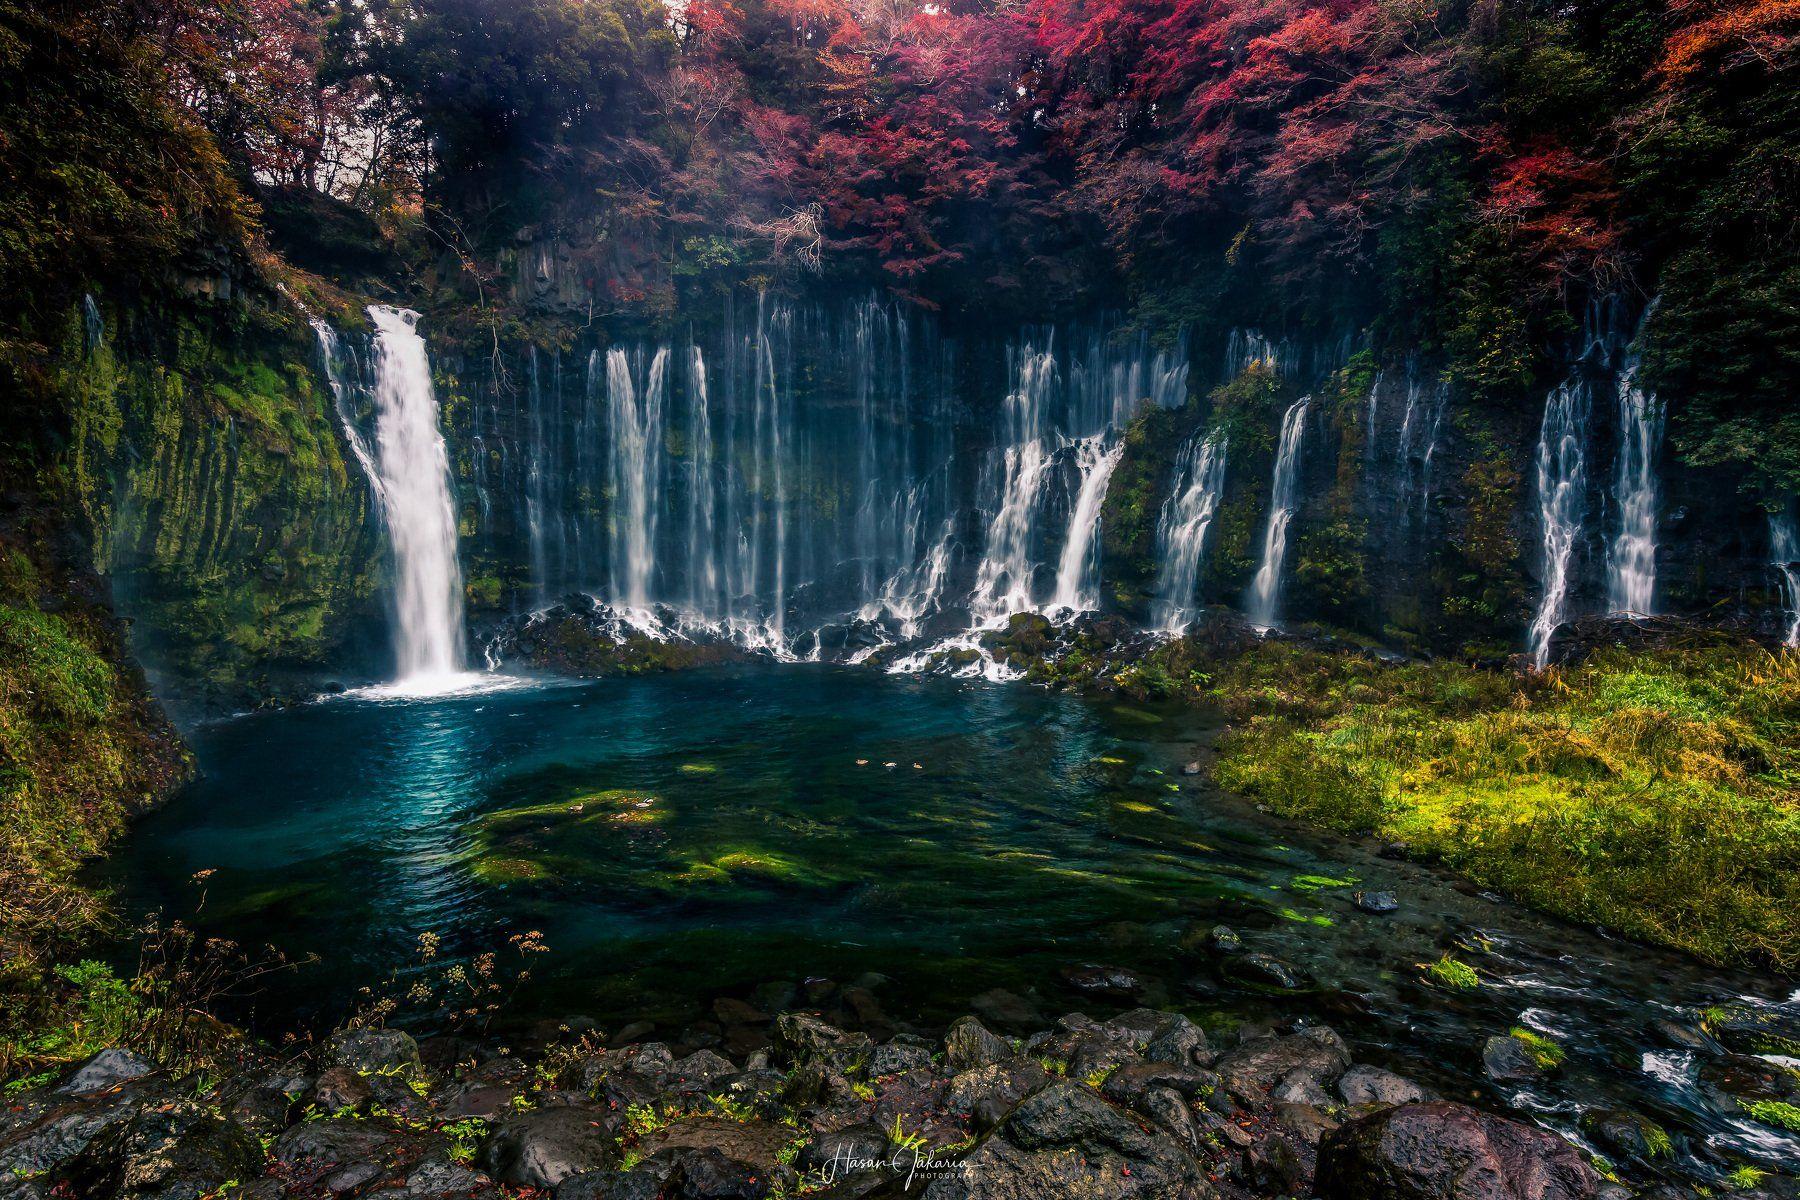 waterfalls landscape nature travel rocks autumn colors japan mt.fuji, Hasan Jakaria